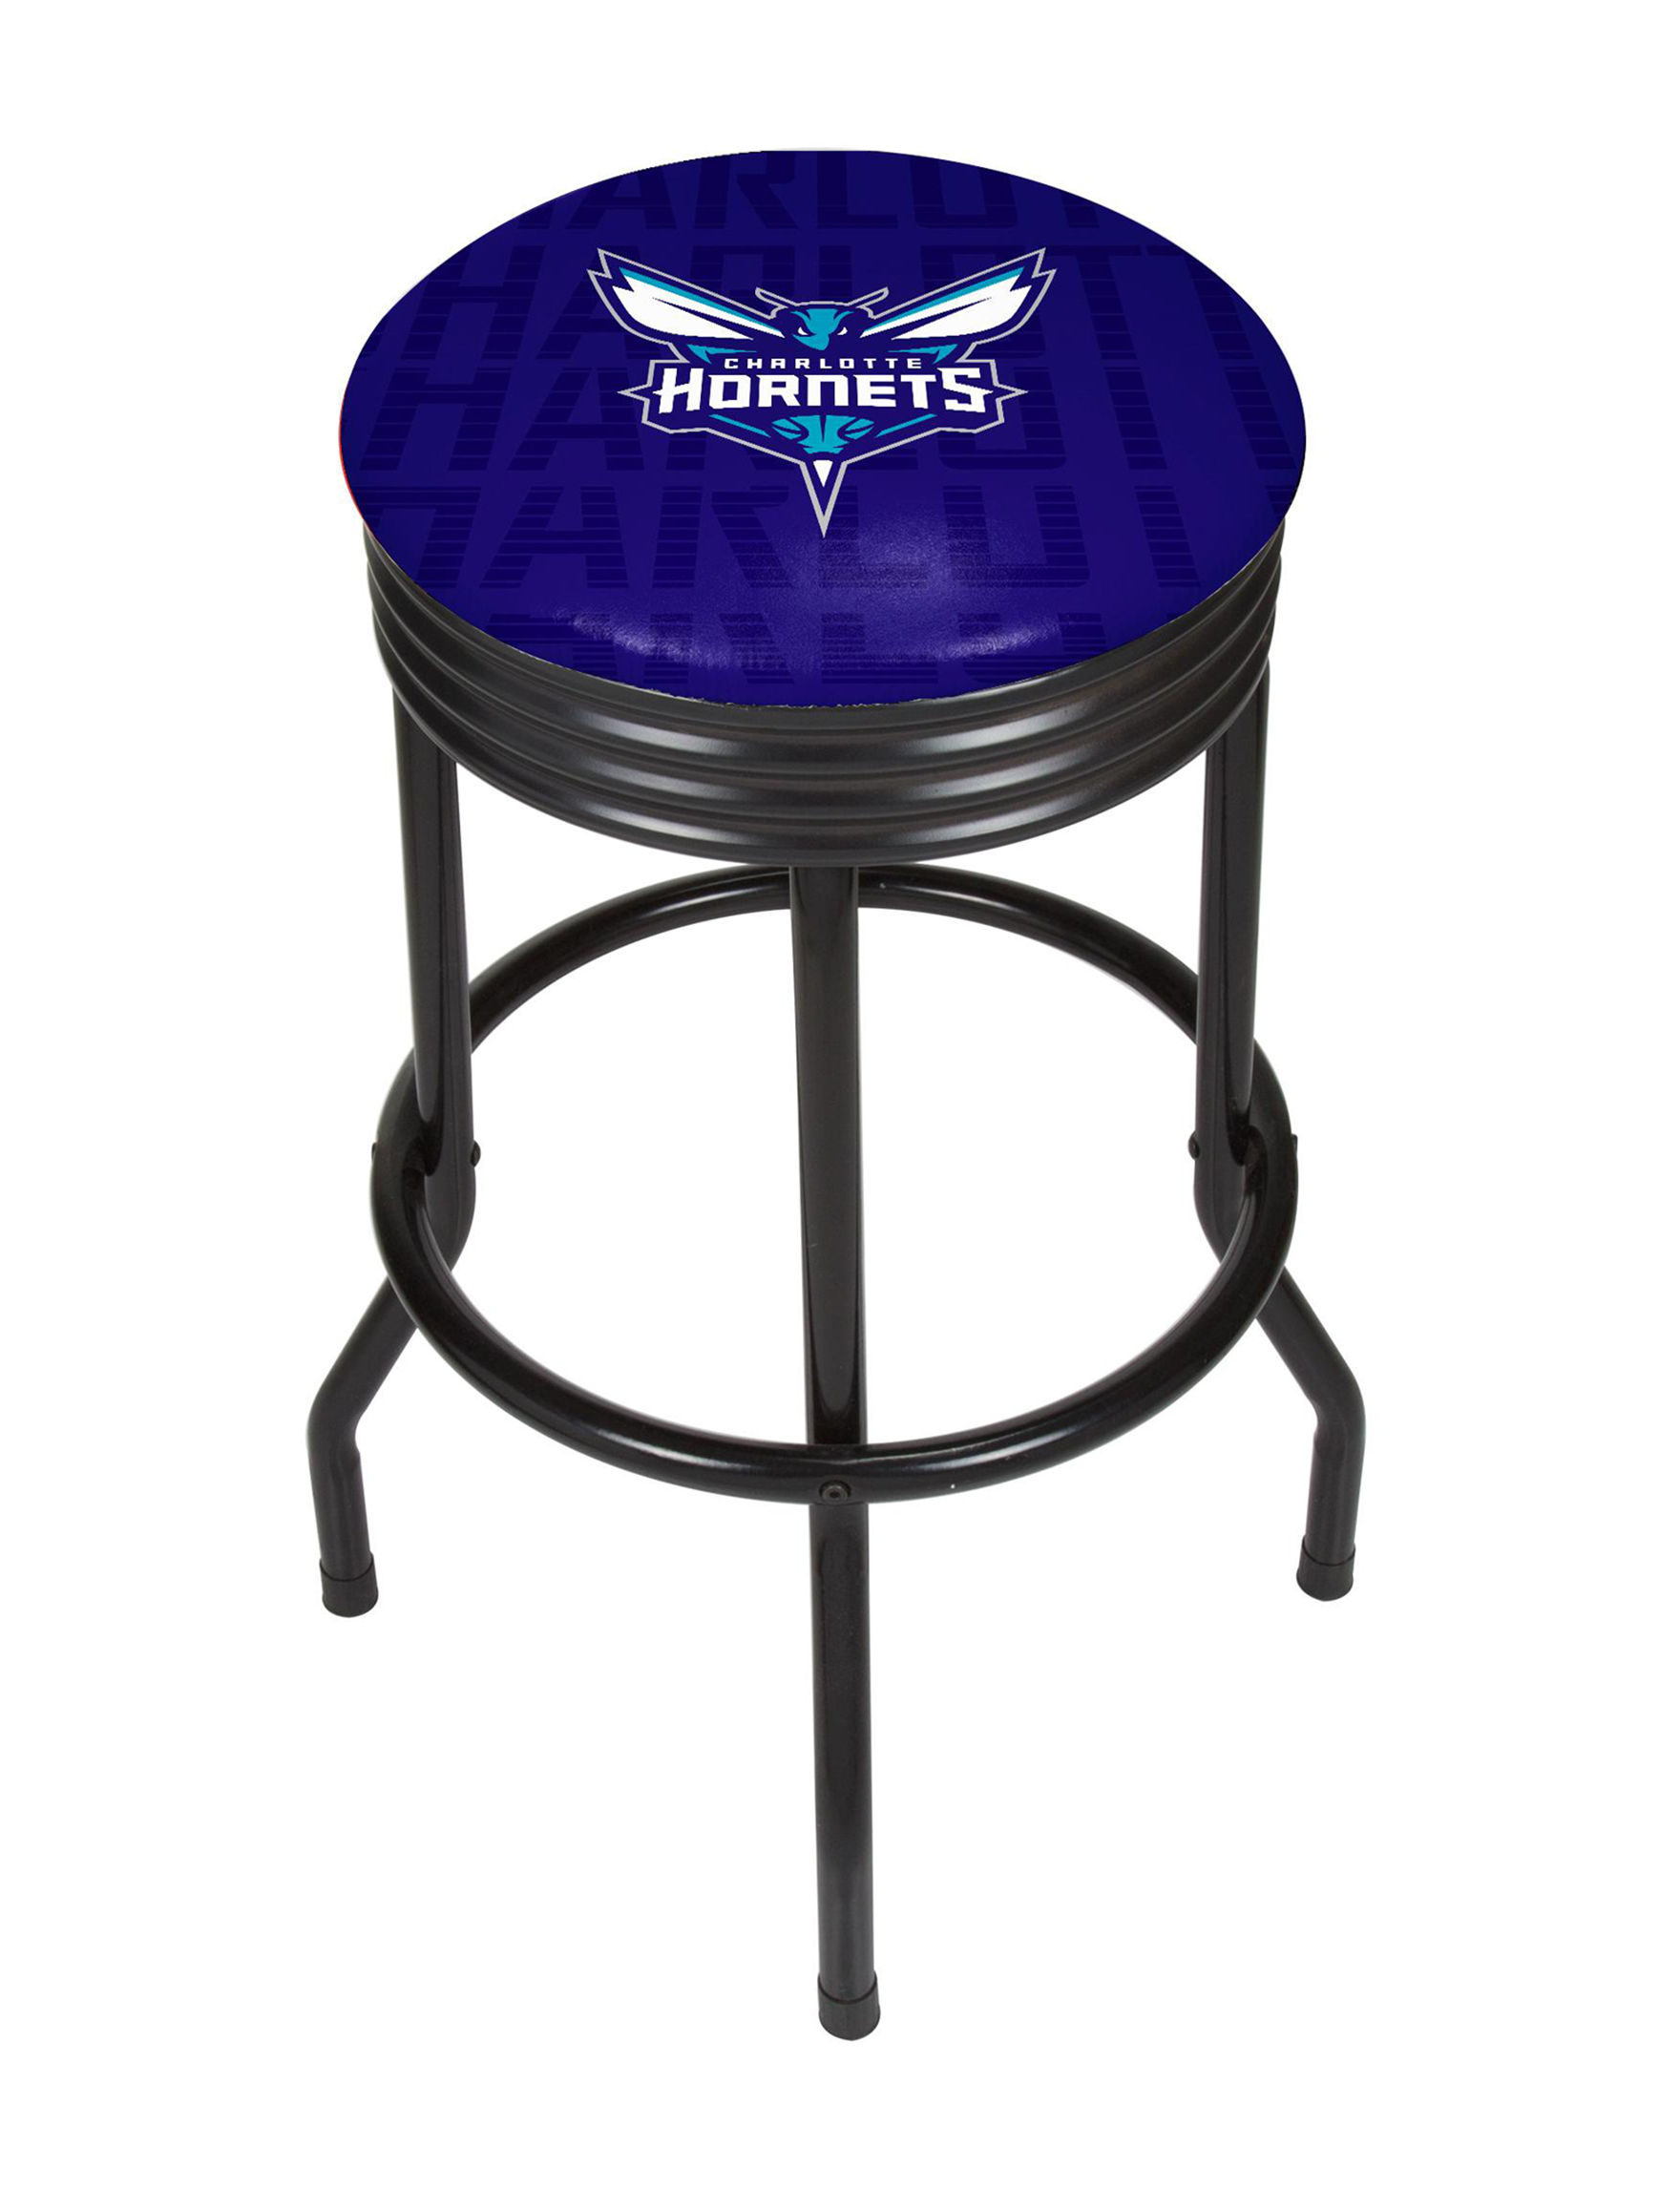 NBA Purple / Teal Bar & Kitchen Stools Kitchen & Dining Furniture